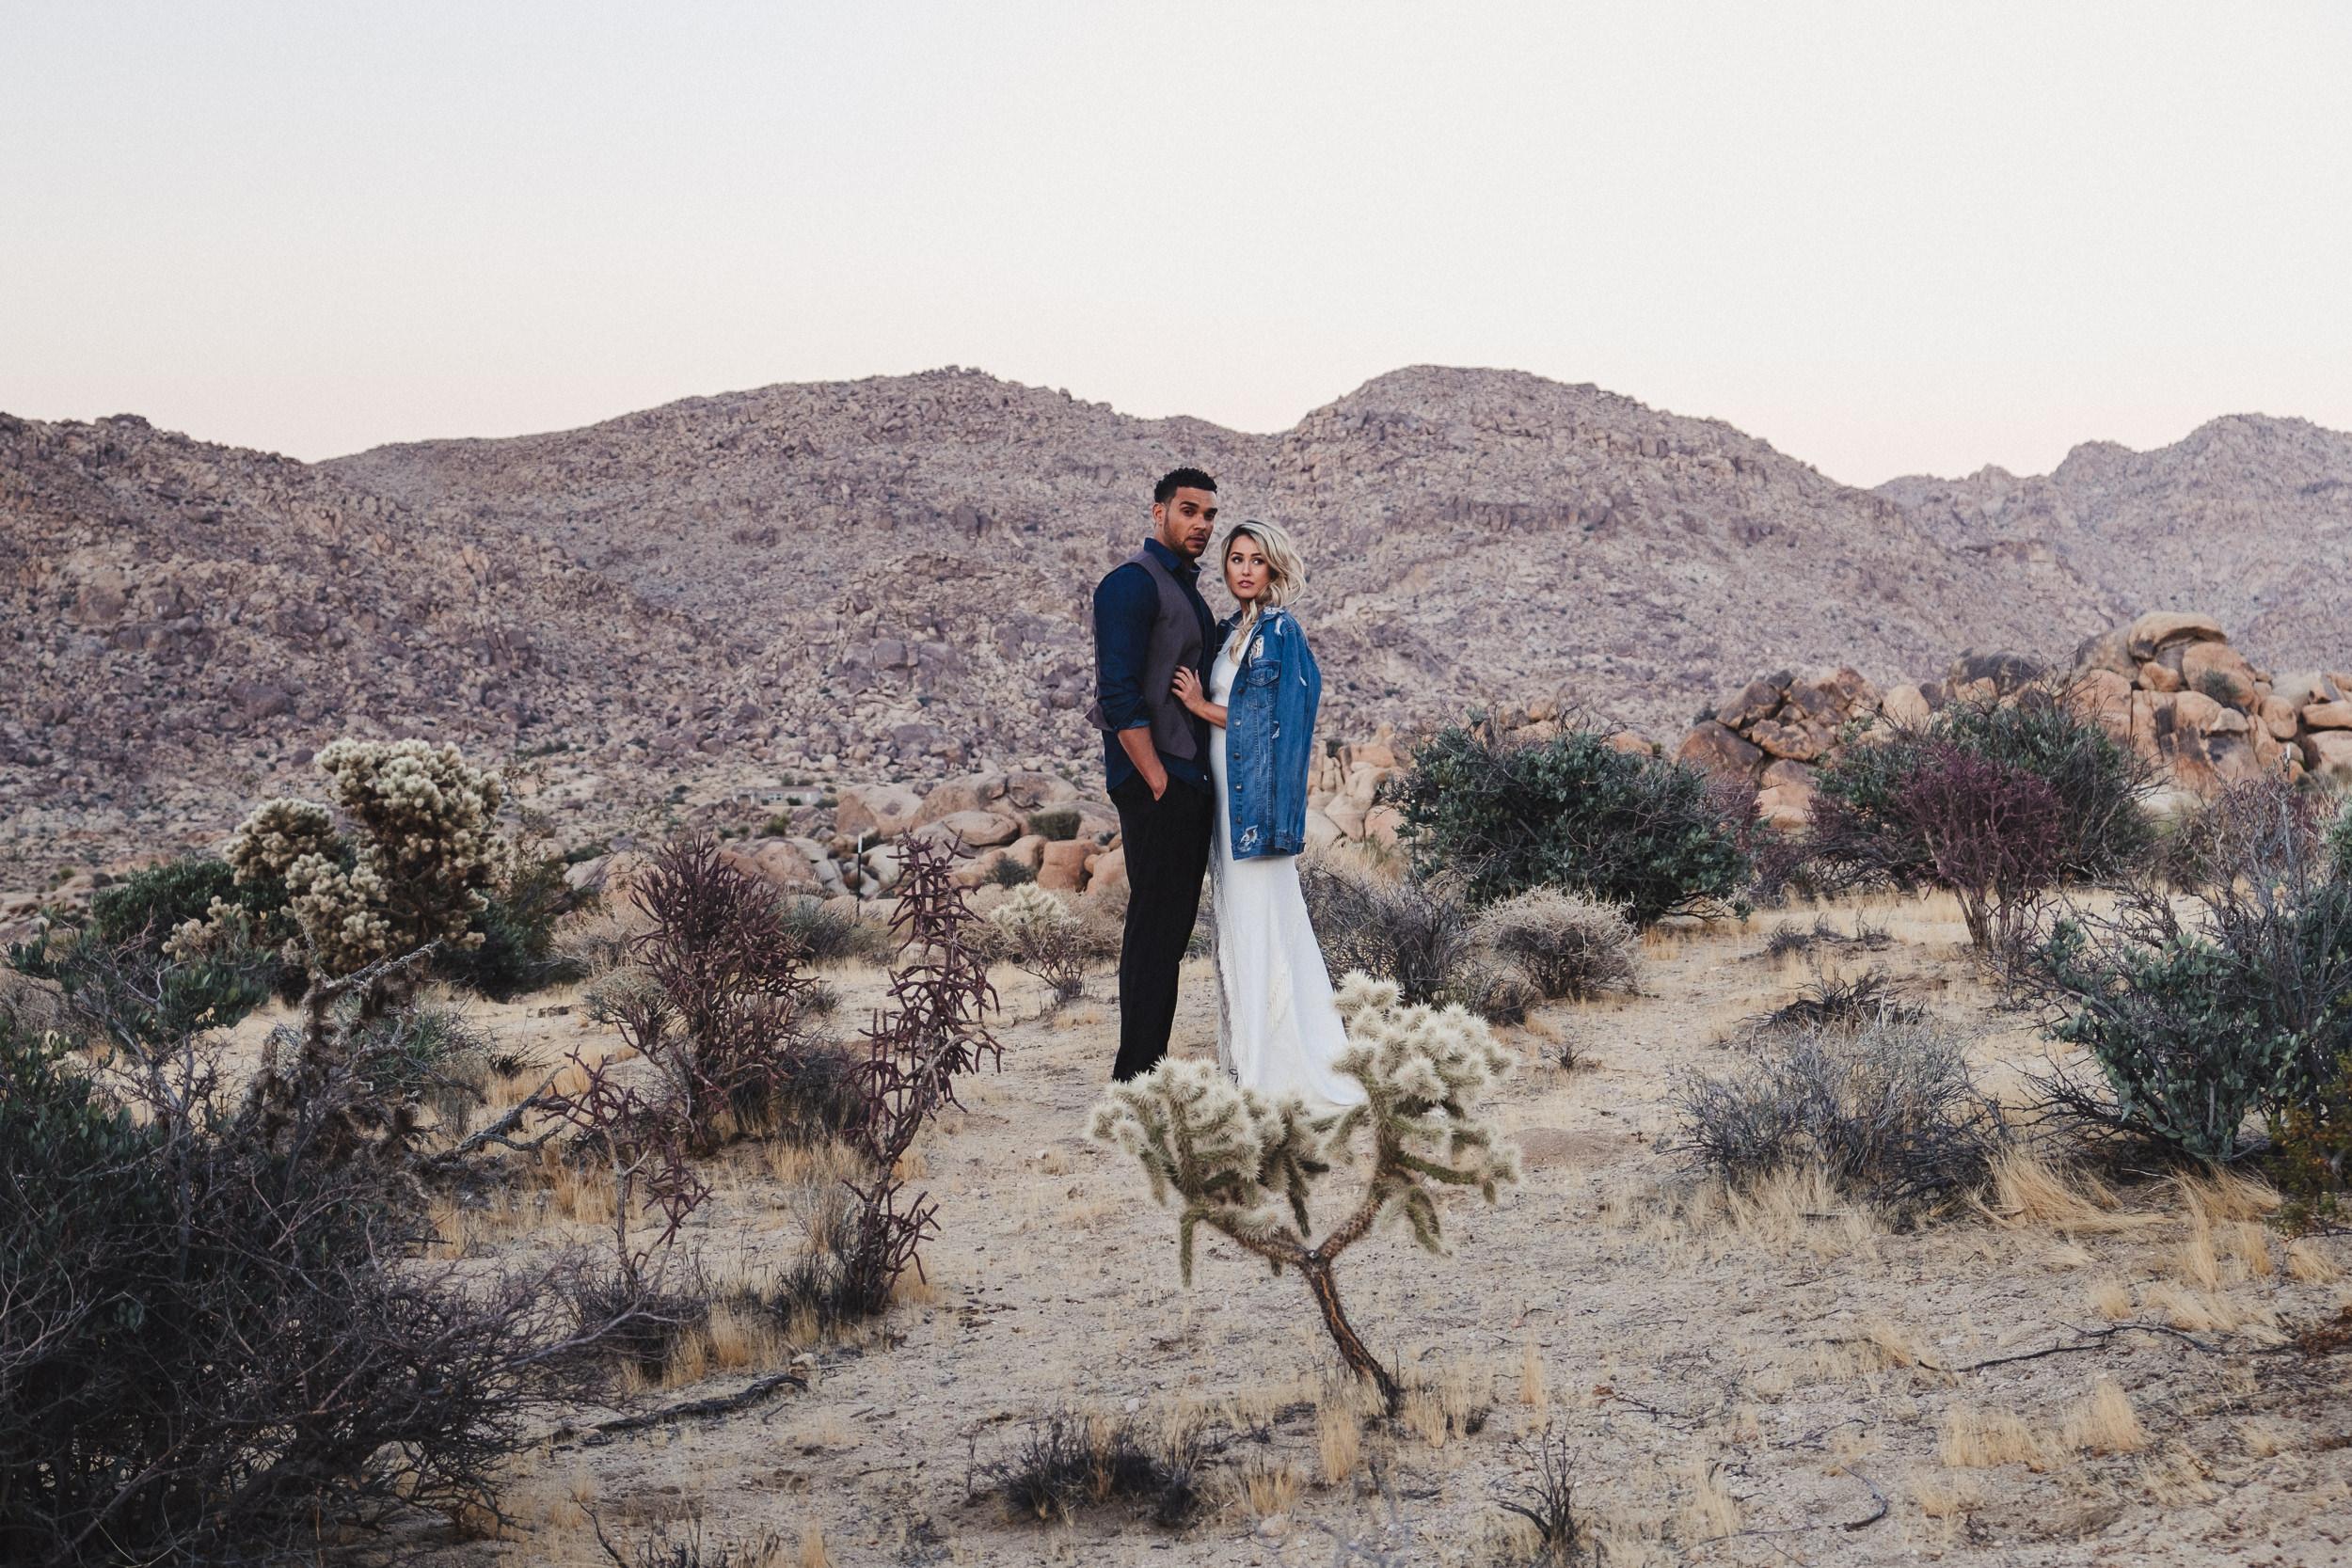 sKarlee + Jamall - Engagement Shoot, Joshua Tree CA-9.jpg